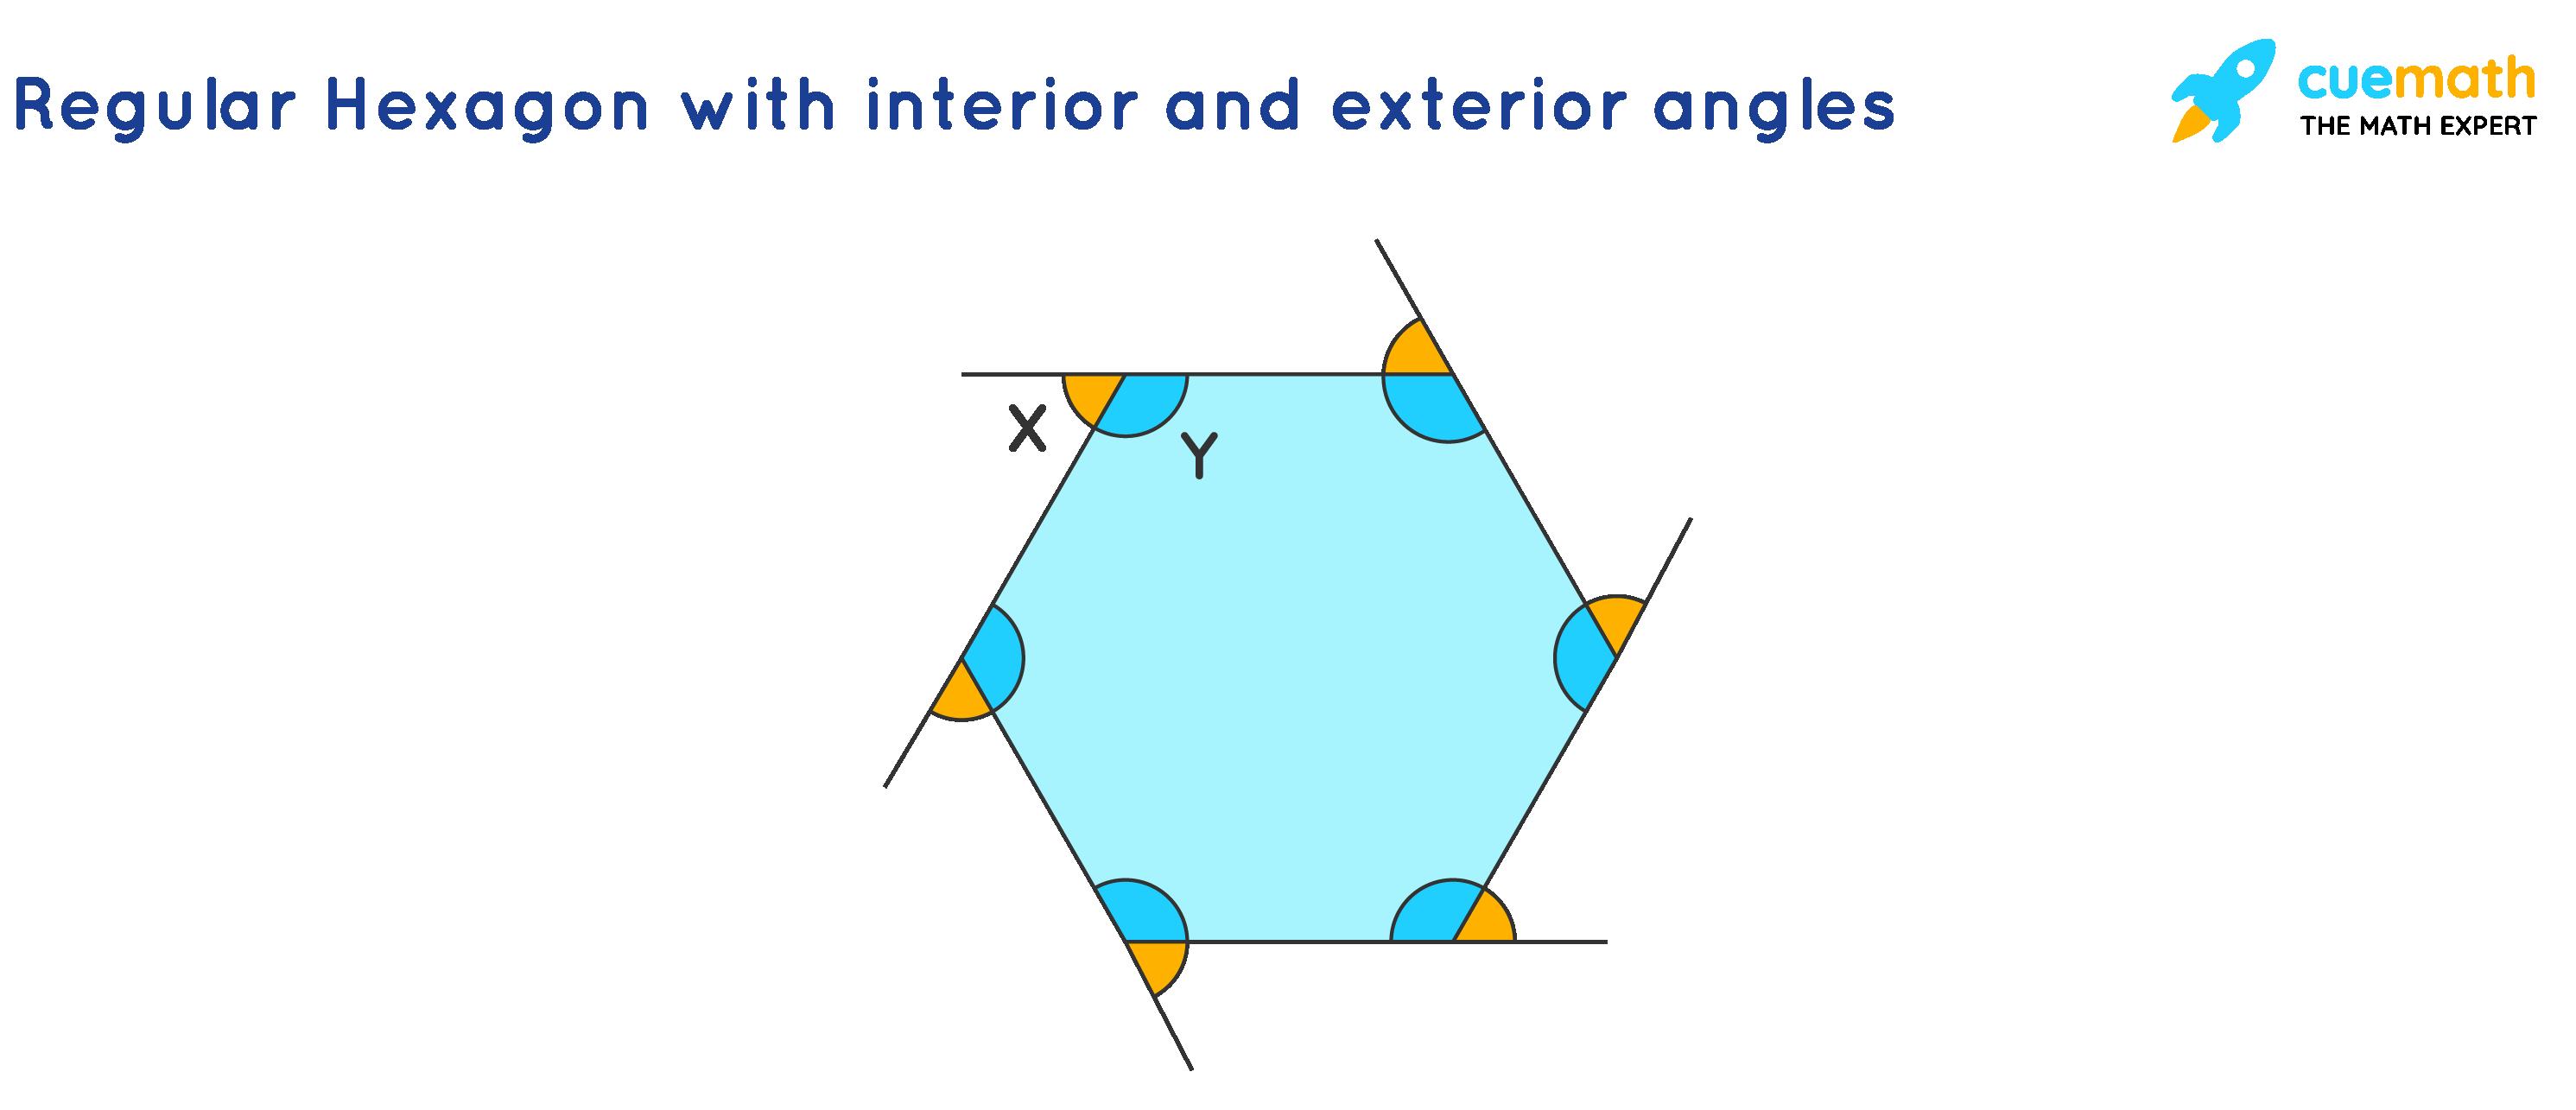 Measure of Interior angles in a regular hexagon.